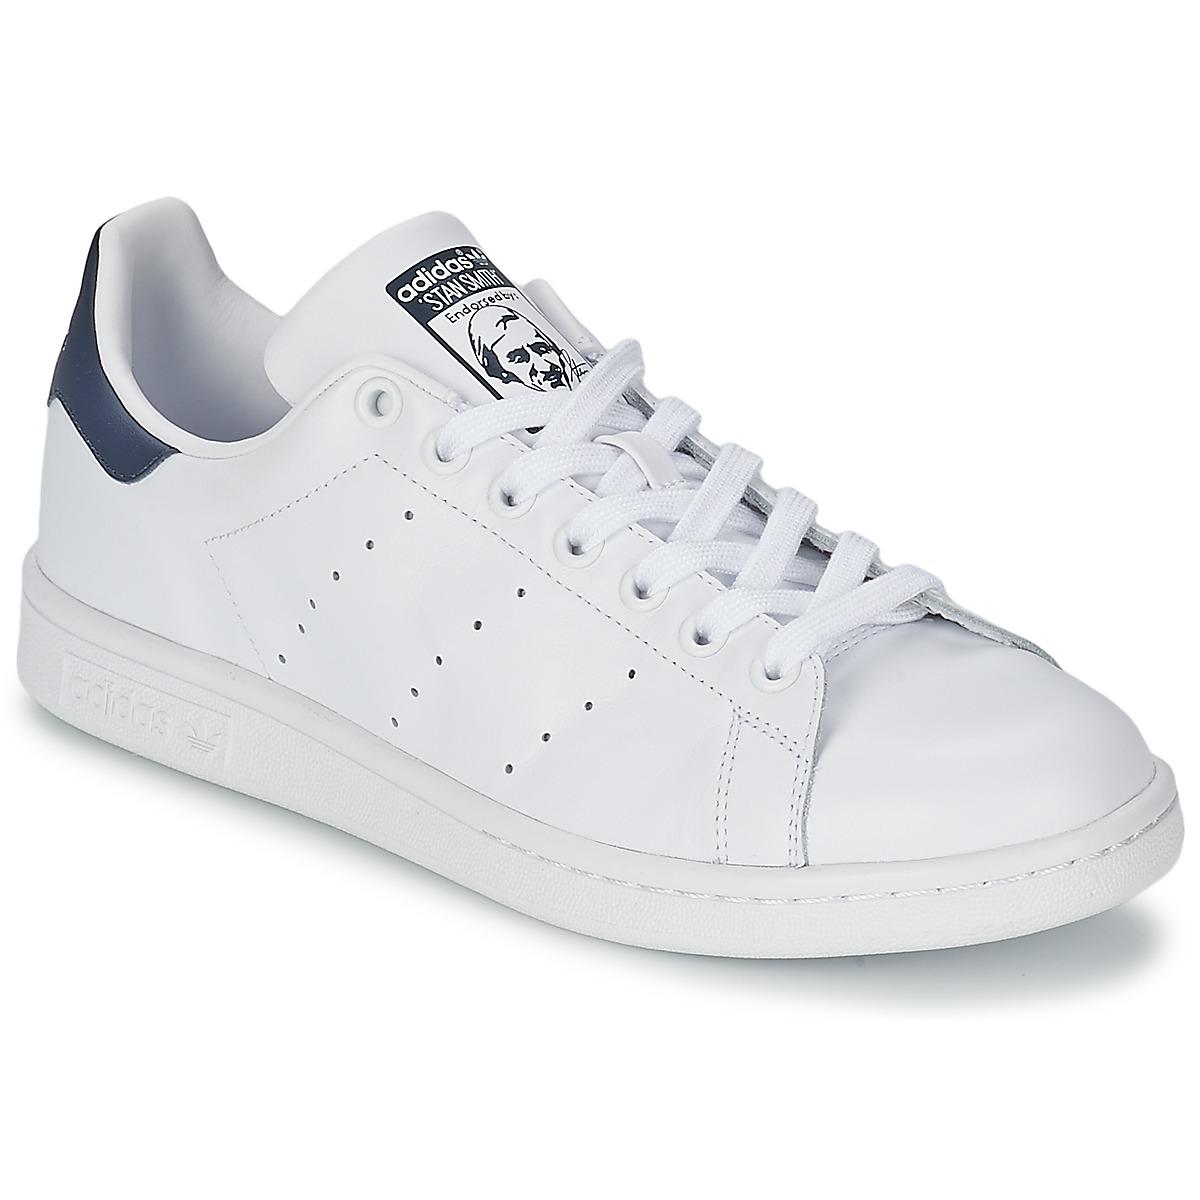 Adidas Stan Smith Dam Blå